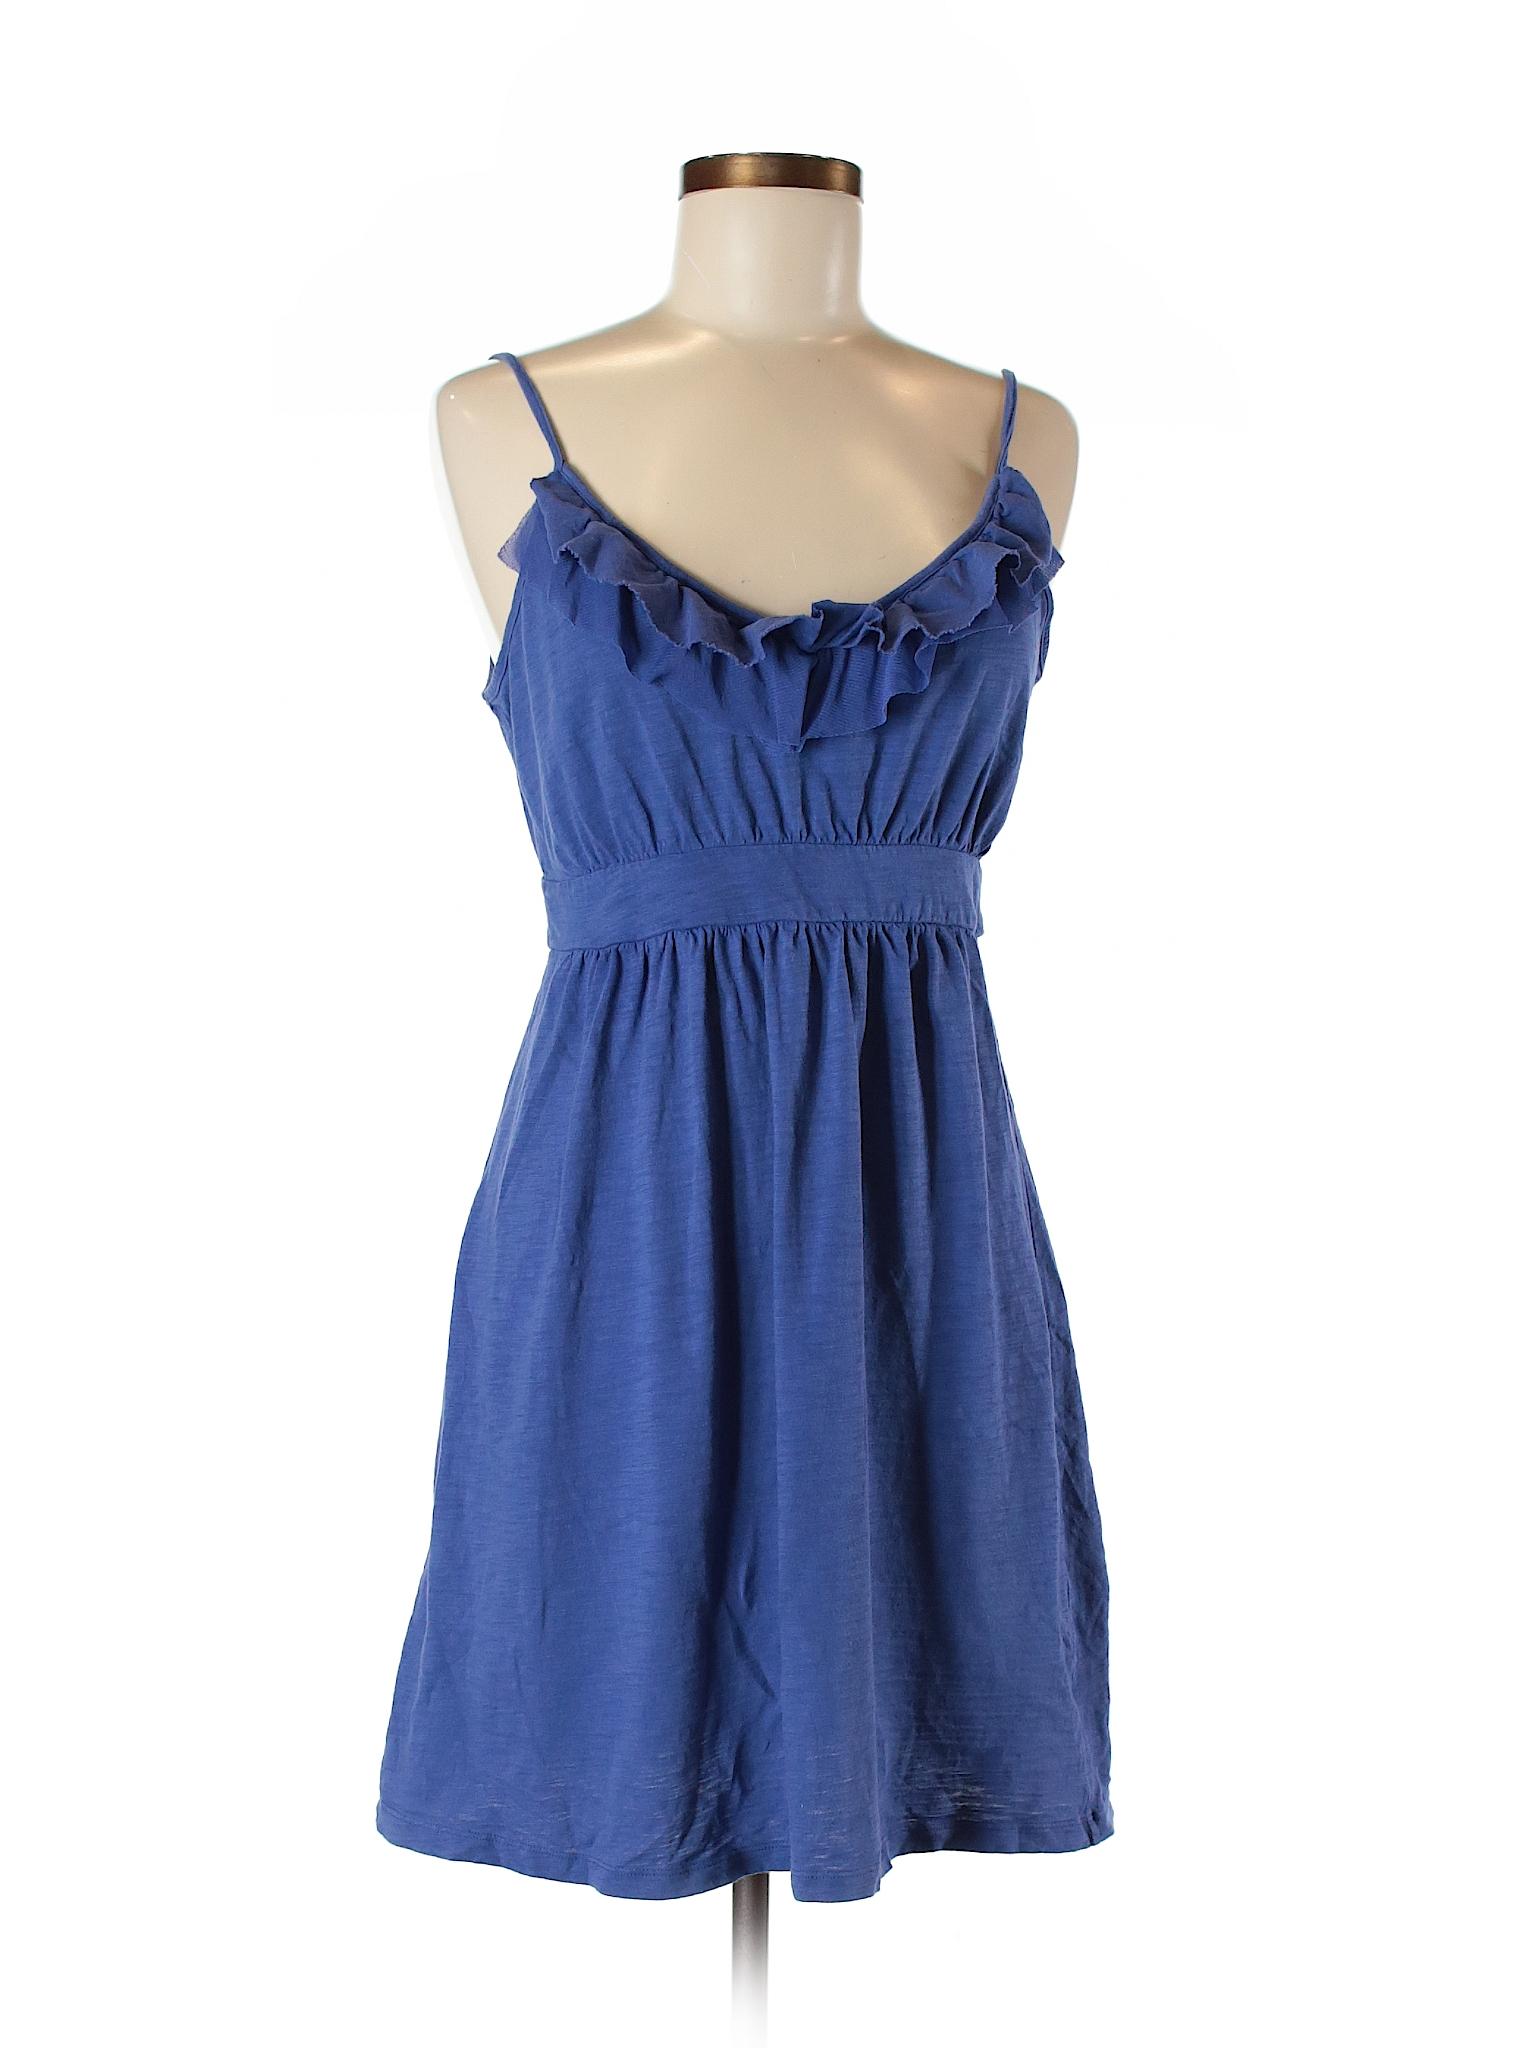 Factory Boutique Republic Winter Casual Store Dress Banana R6xt6gw